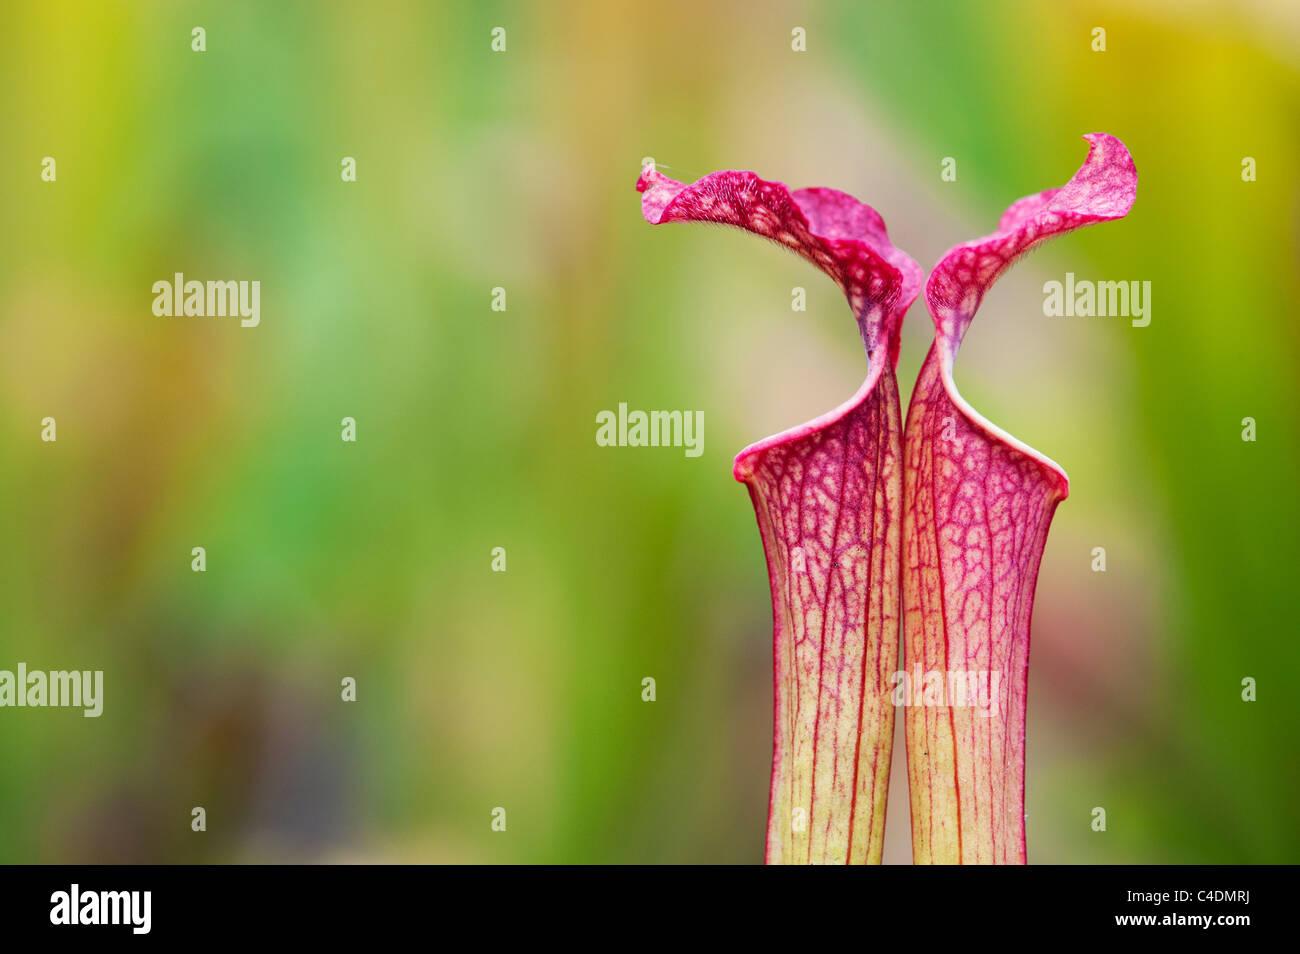 Sarracenia x farnhamii. Pianta brocca. Pianta carnivora Immagini Stock